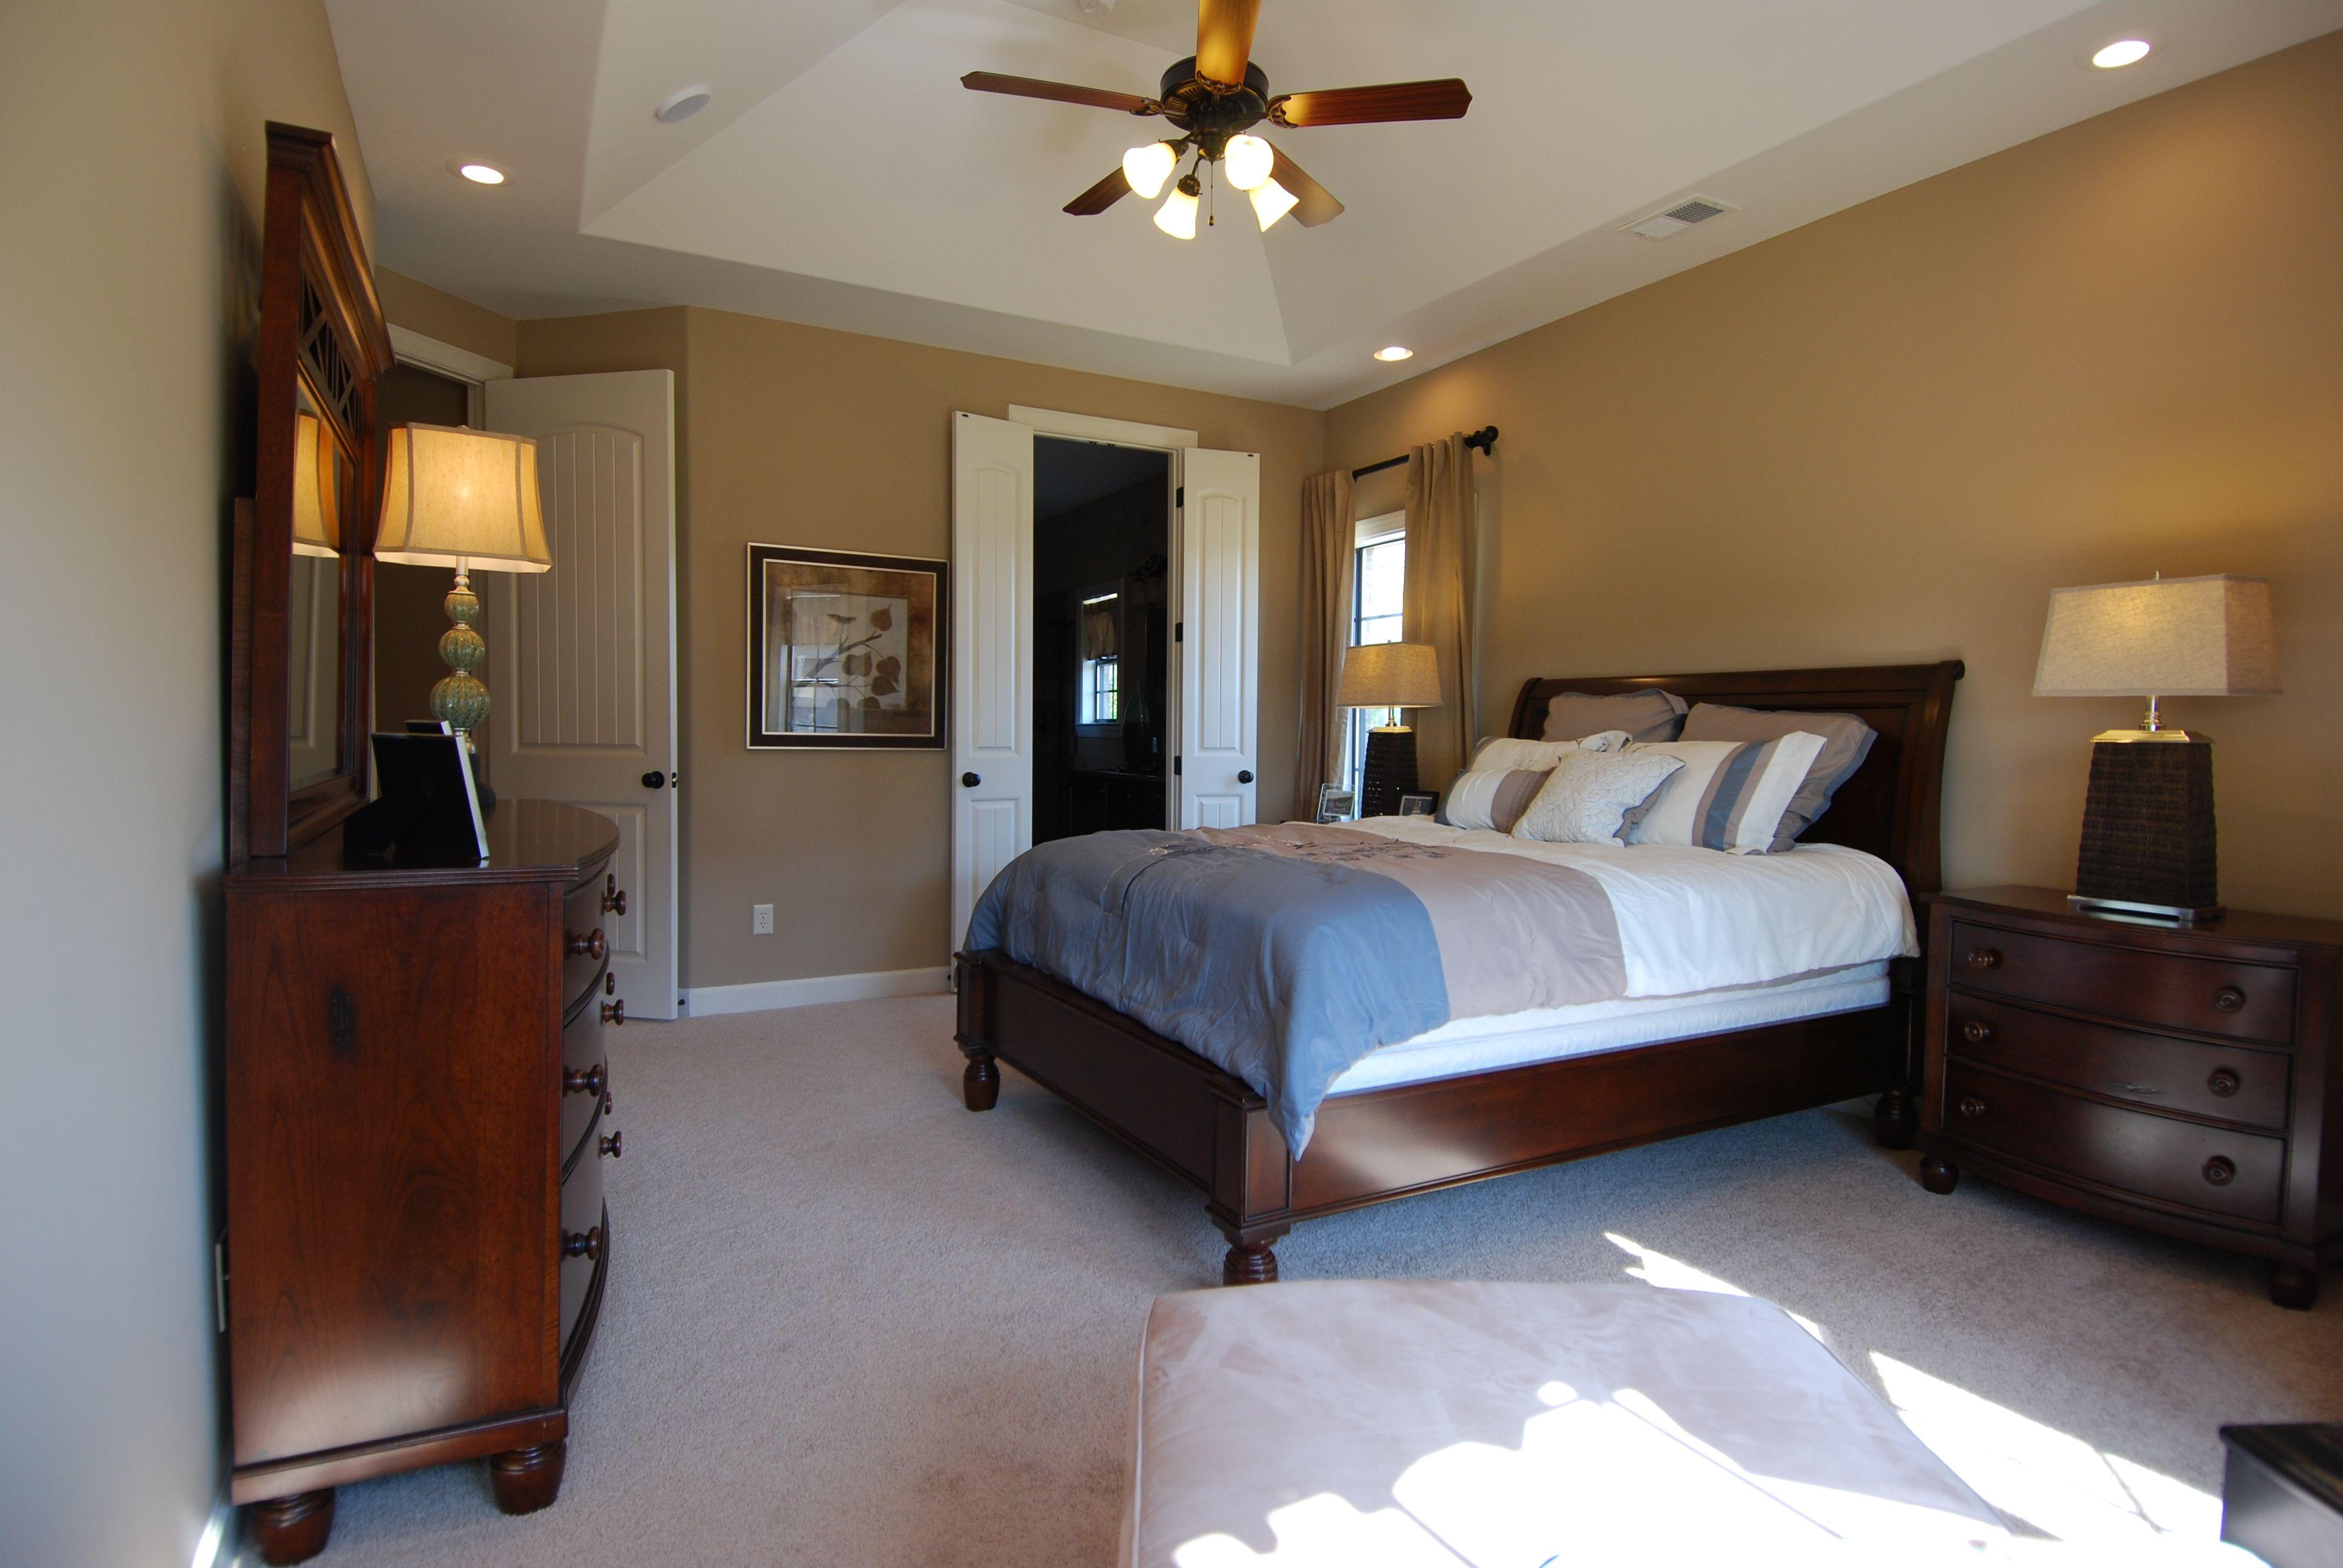 Regency Homebuilders : Large Master Bedroom, Neutral, Pops Of Color, Recessed  Lighting,